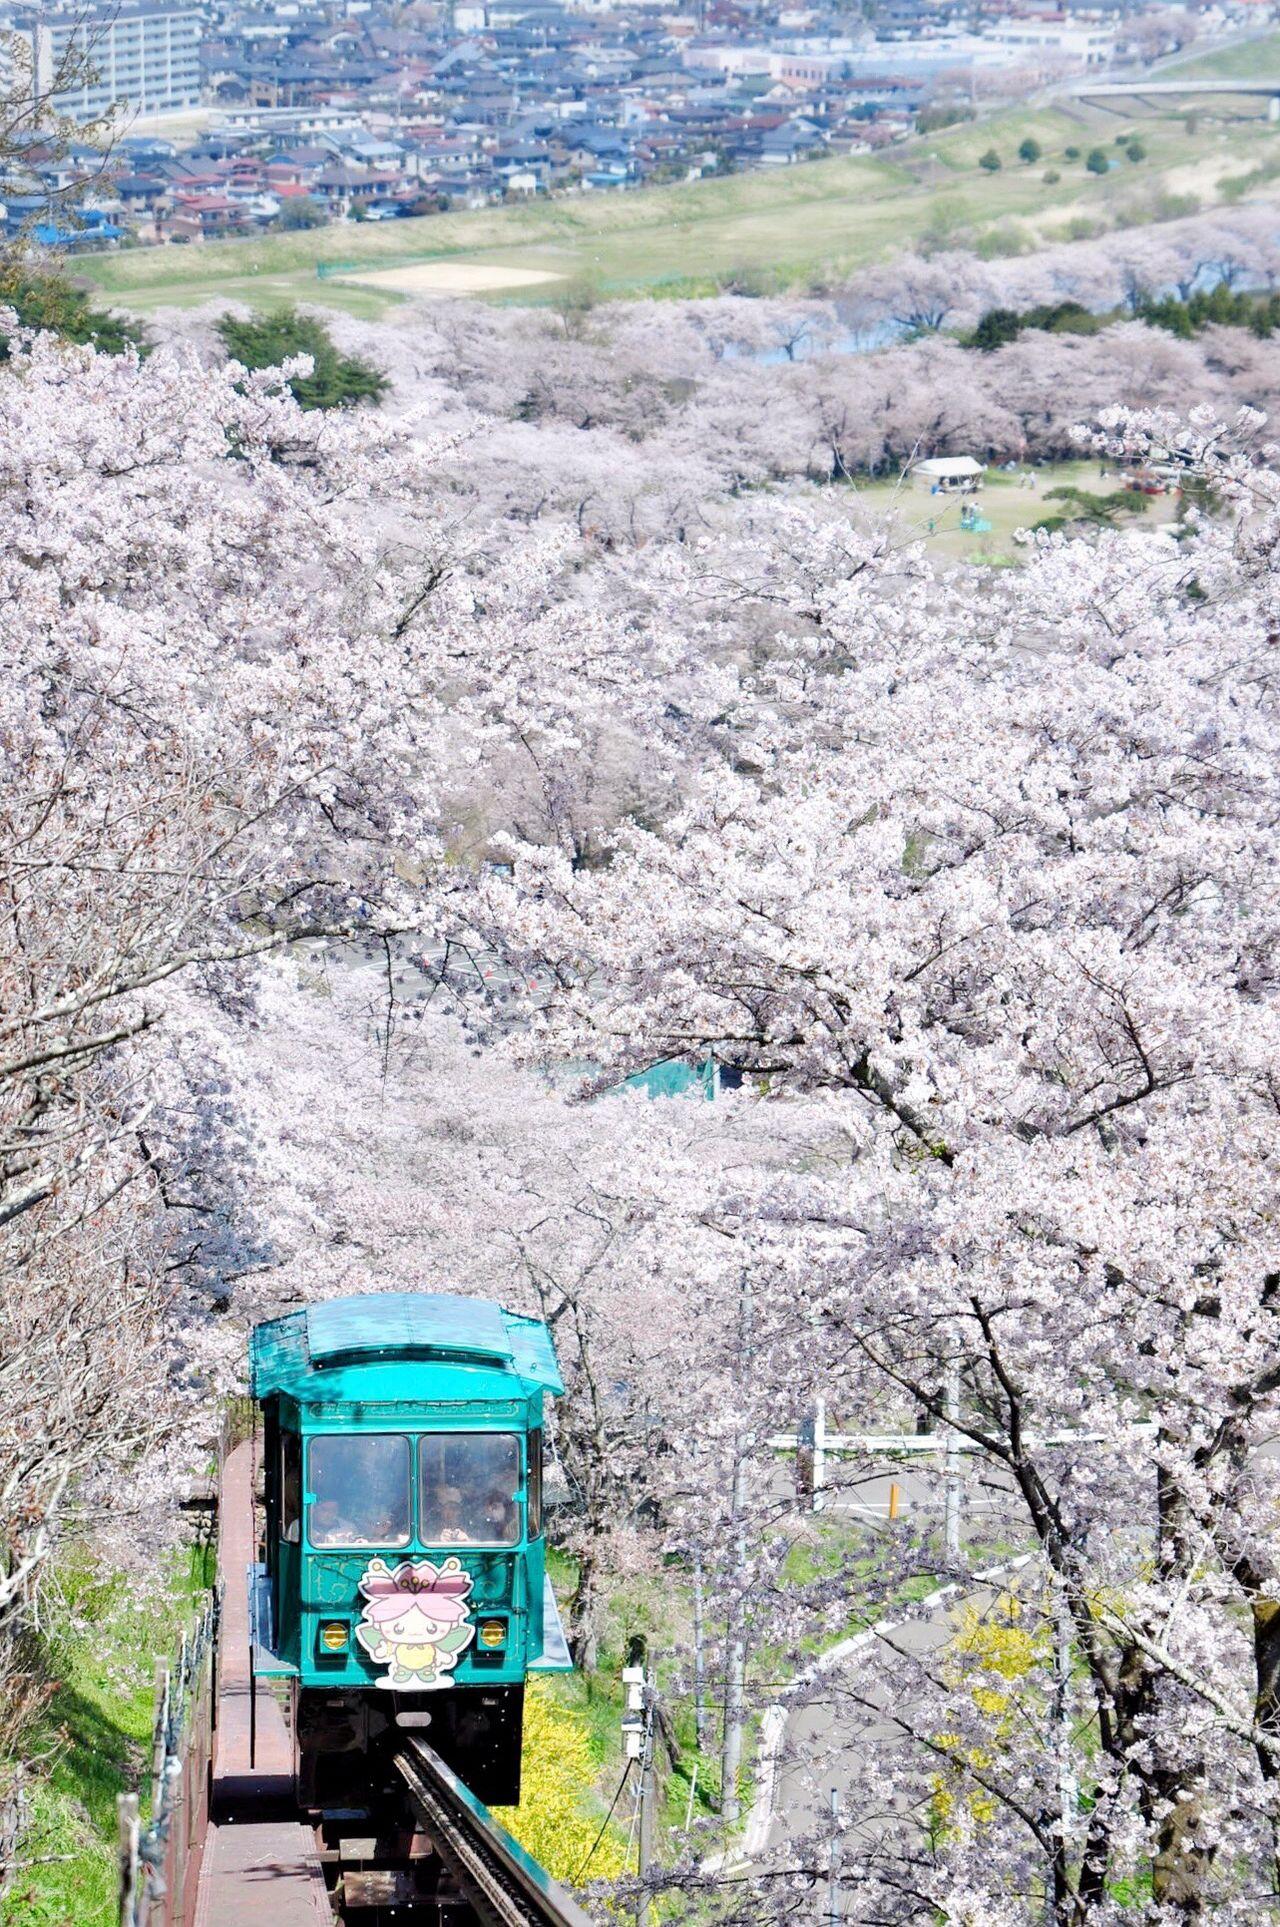 Monorail running through sakura trees Monorail  Monorail Train View Sakura Sakura Blossom Sakura Trees Cherry Blossoms Cherry Blossom Spring Spring Flowers Spring Has Arrived Japan Japan Photography Spring In Japan Tohoku Funaoka Neighborhood Map Miyagi